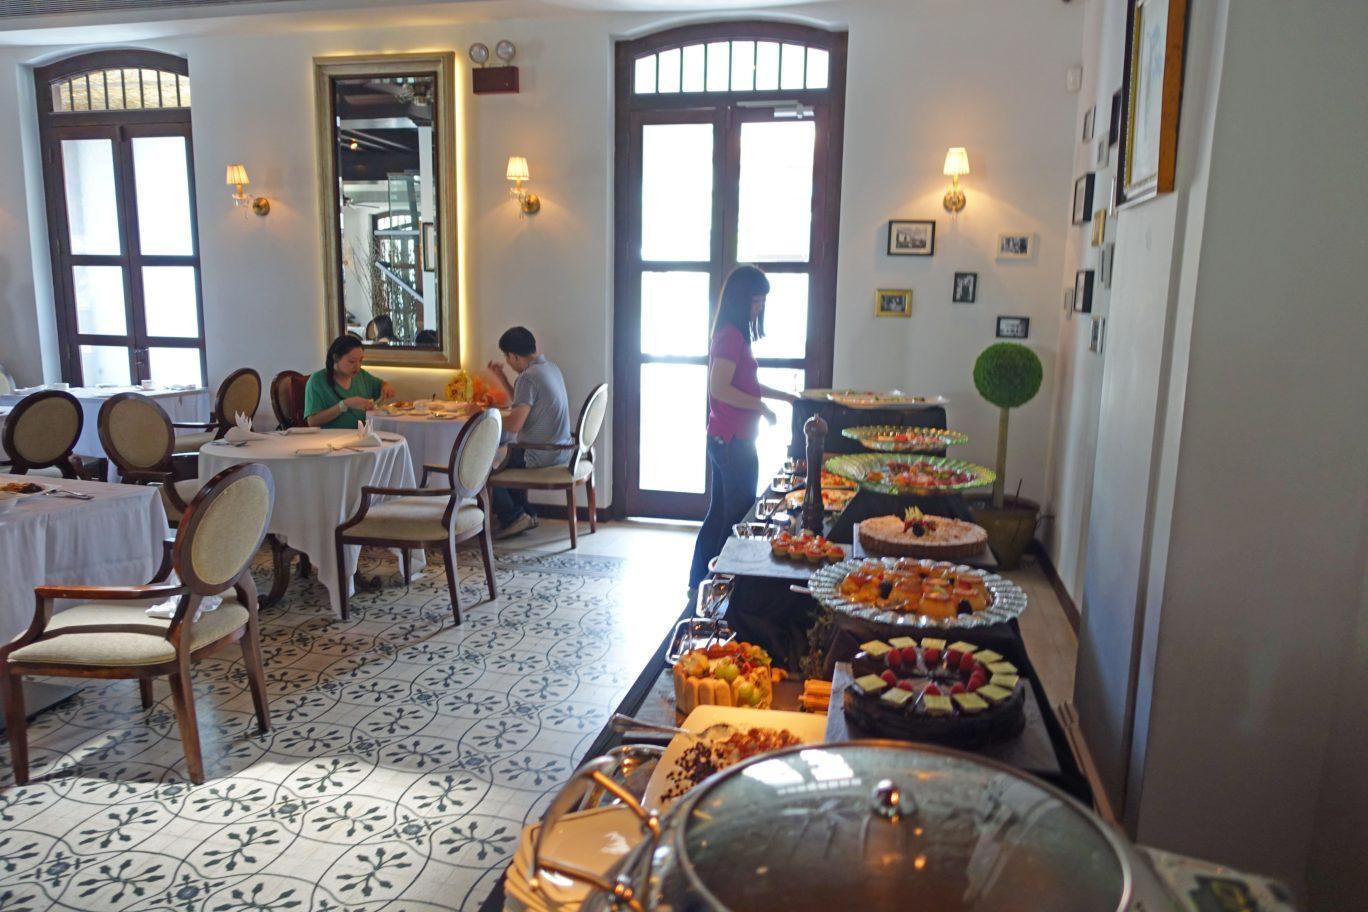 alkaff mansion ristorante food spread singapore